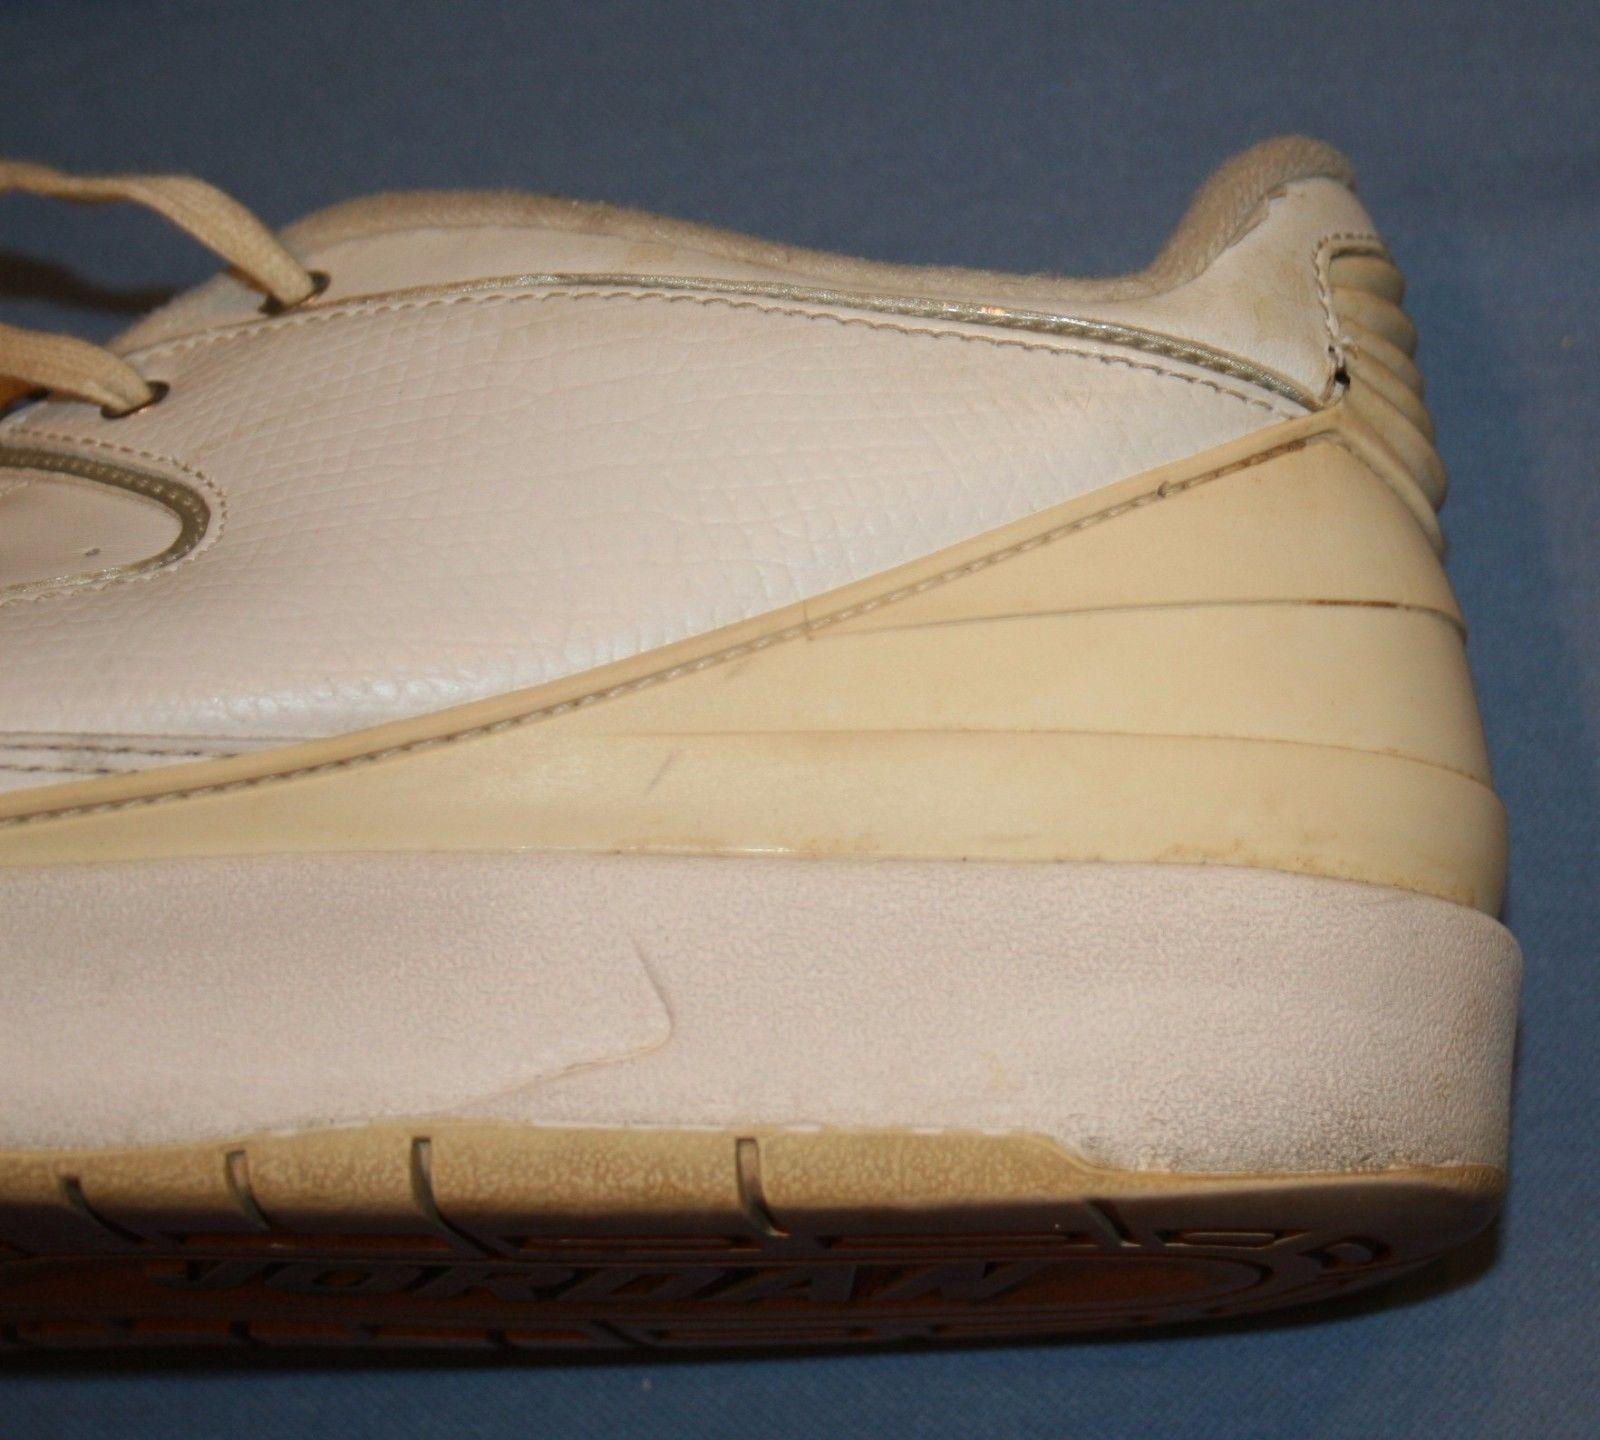 finest selection fddba d18a7 Air Jordan Herren Weiß 20 Year Anniversary Sneakers Sportschuhe 13 85-05  Nike